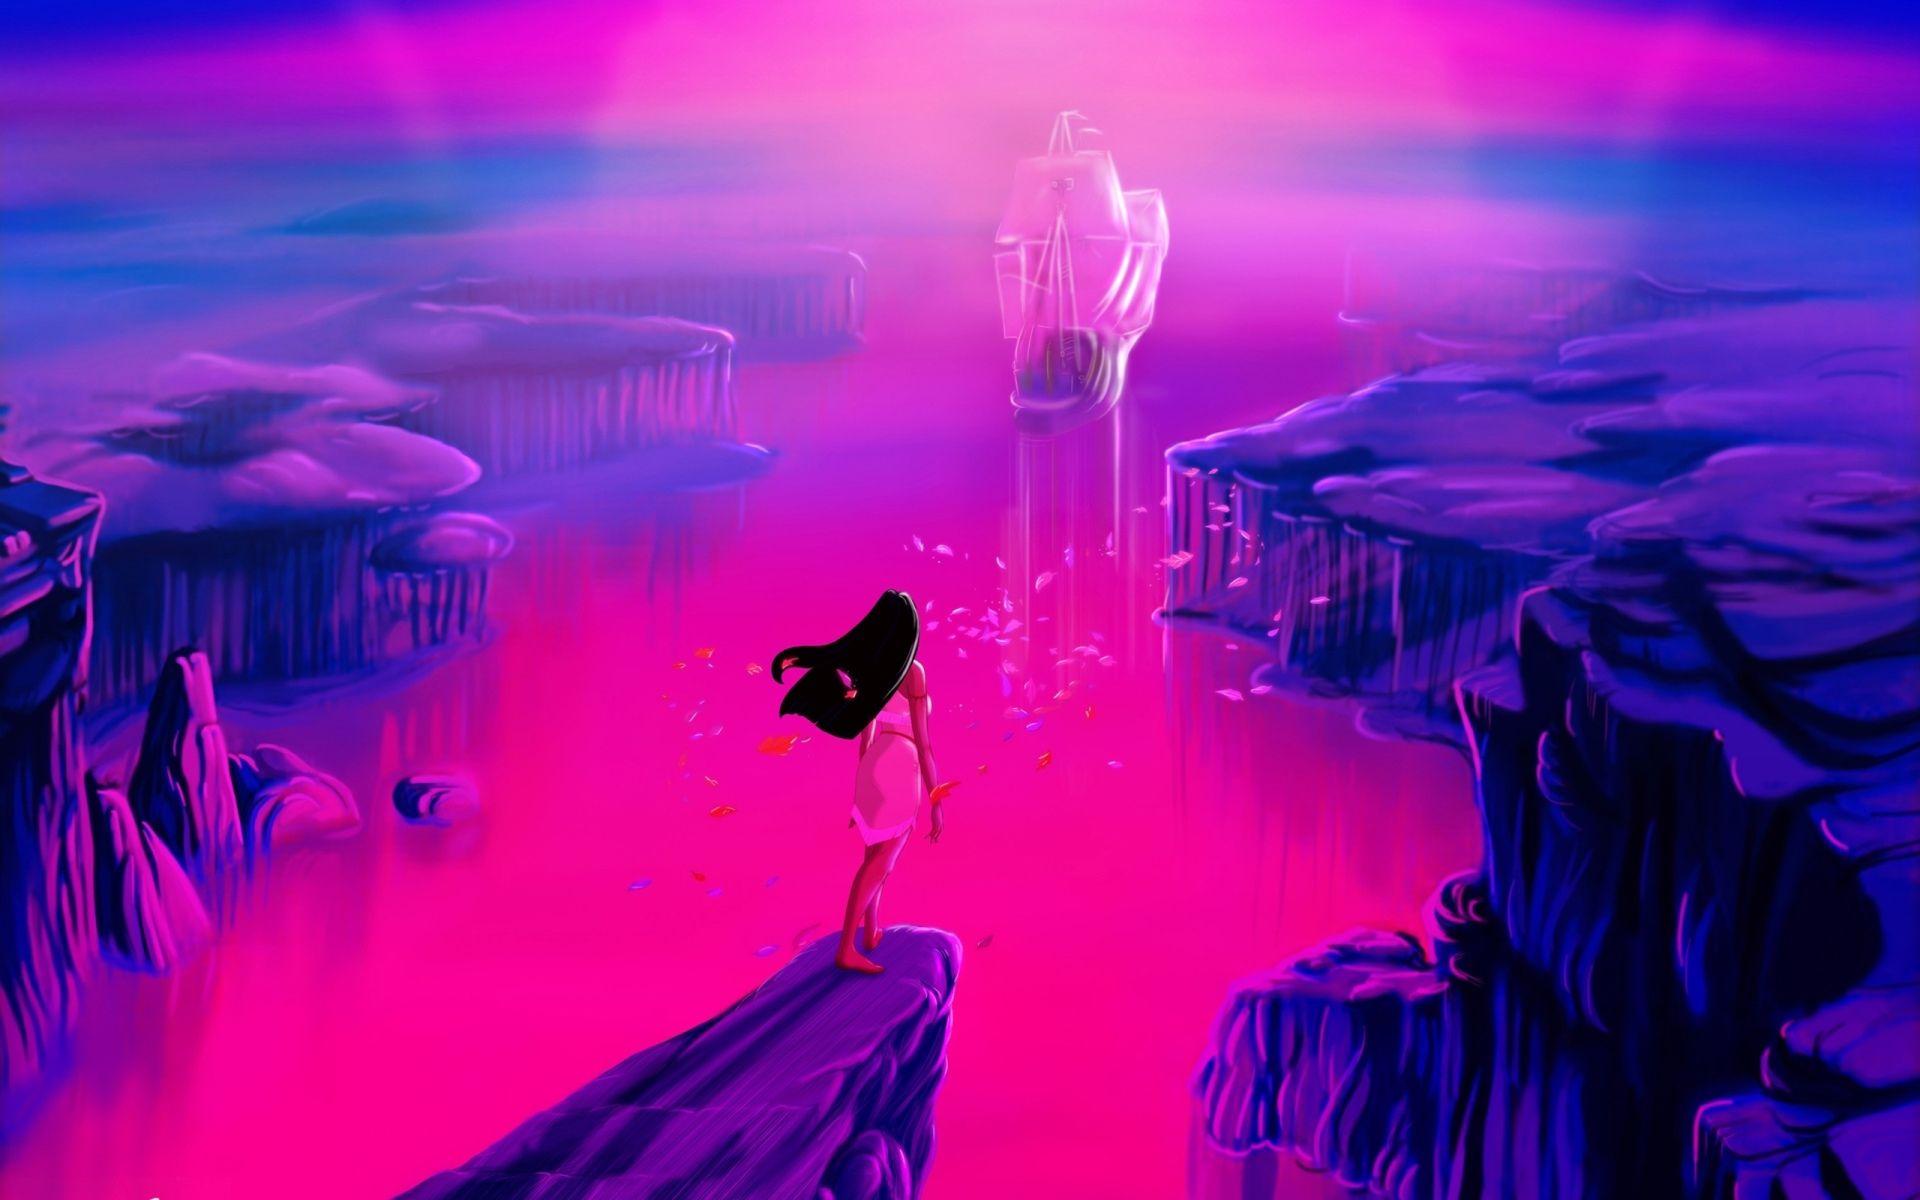 Movie Pocahontas Wallpaper Walt Disney Movies All Disney Movies Pocahontas Movie